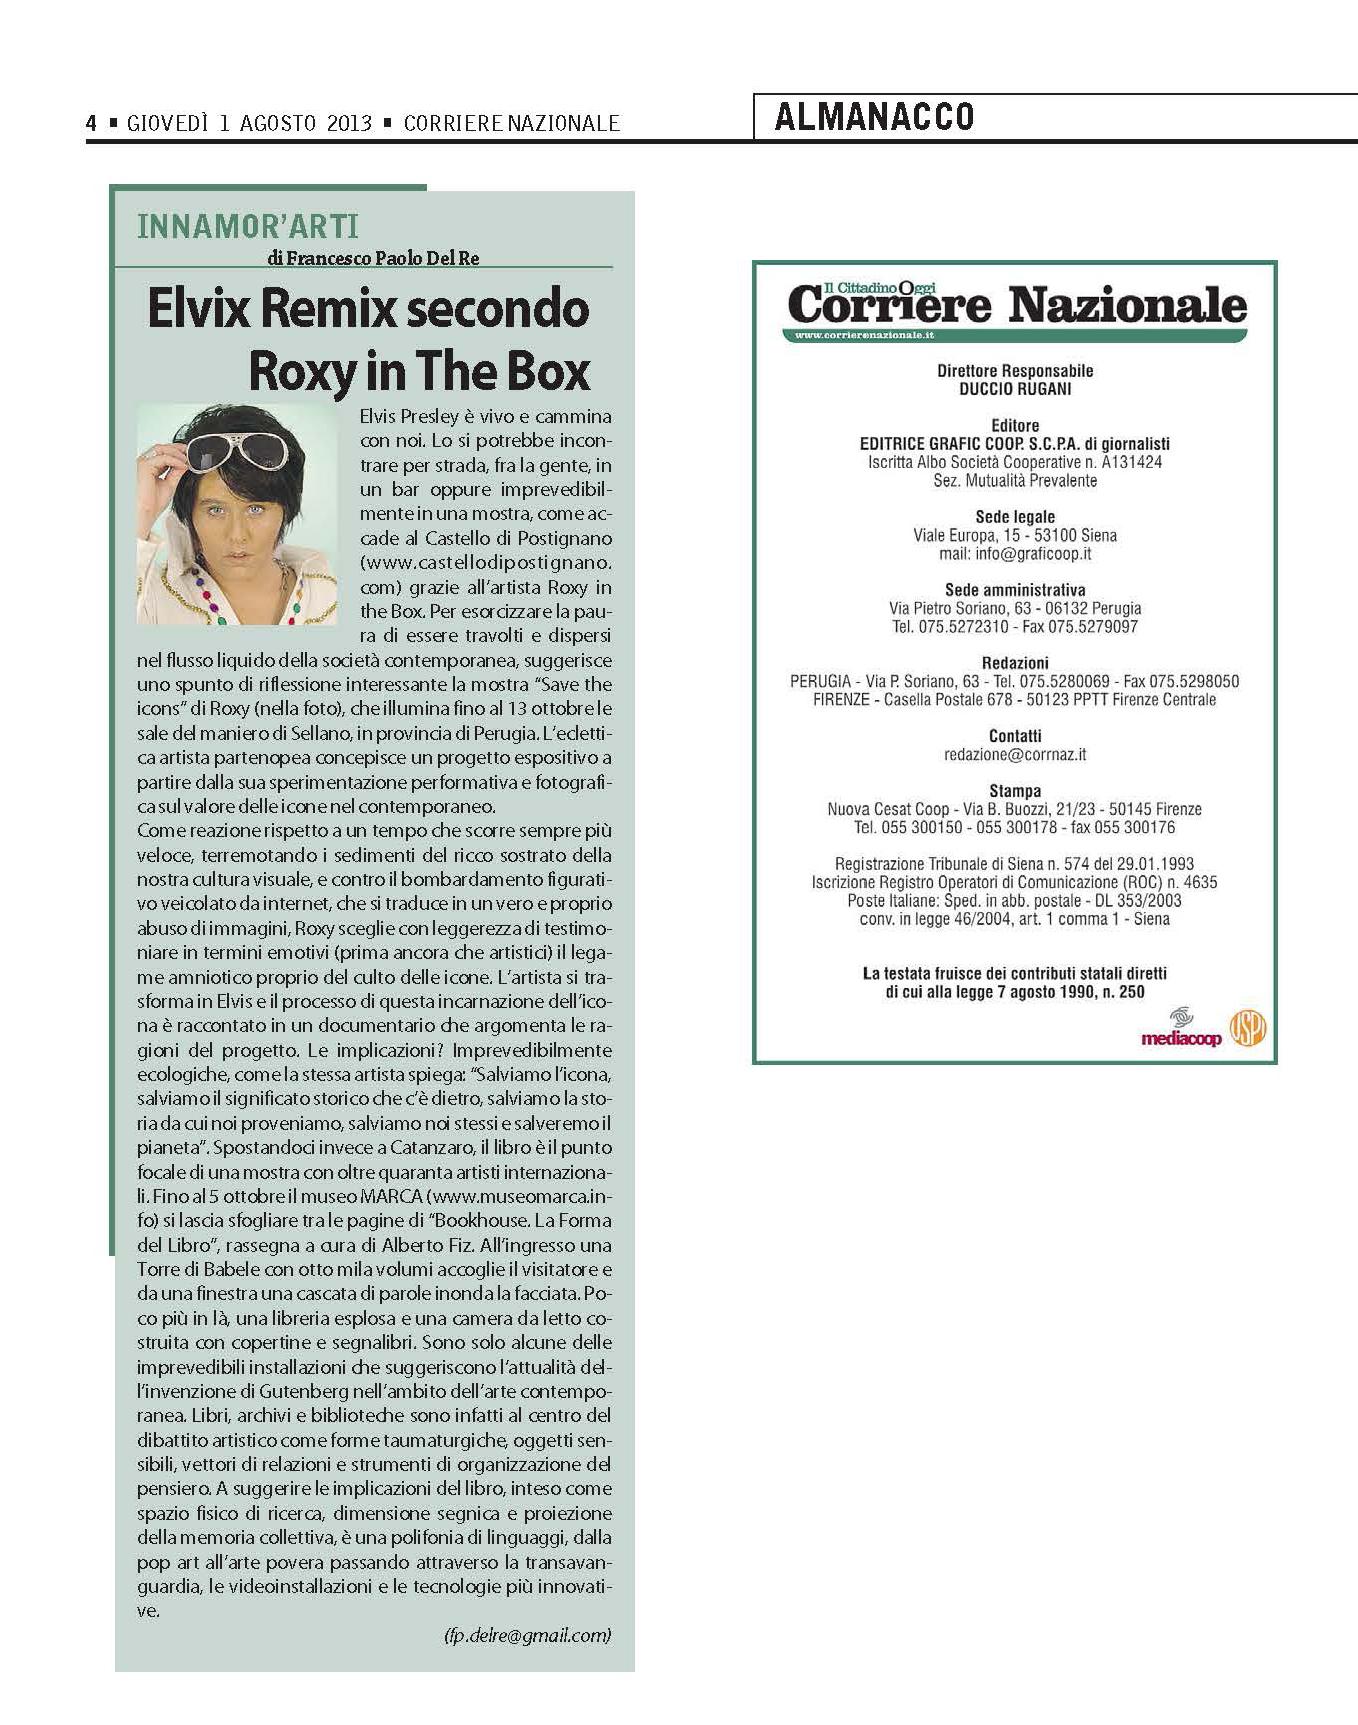 corriere nazionale elvis